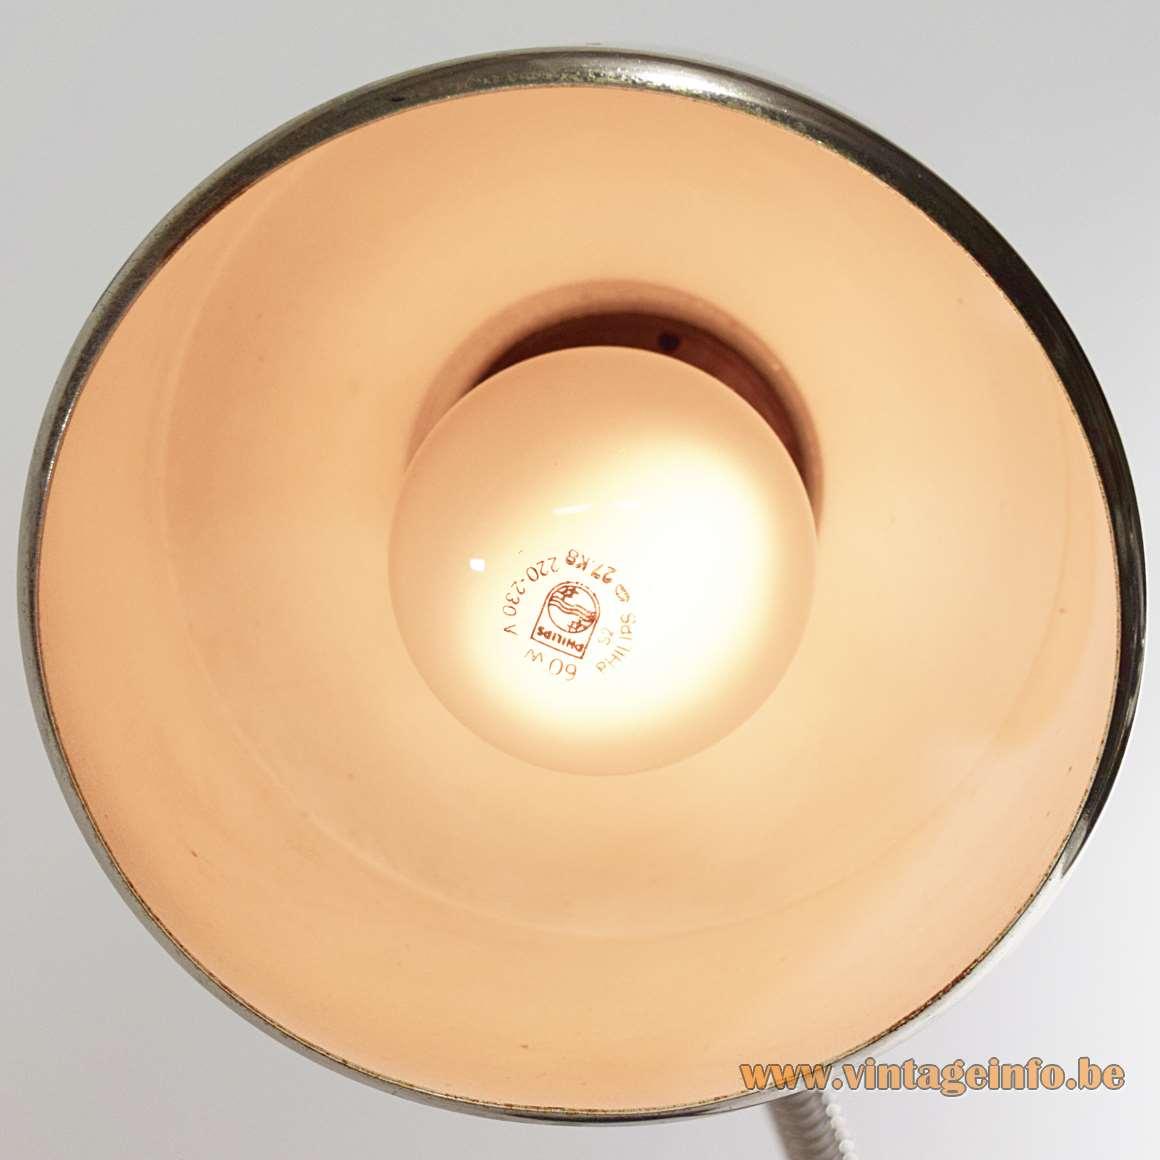 1960s, 1970s gooseneck desk lamp, round base, chrome gooseneck, beige, Massive, Belgium, MCM